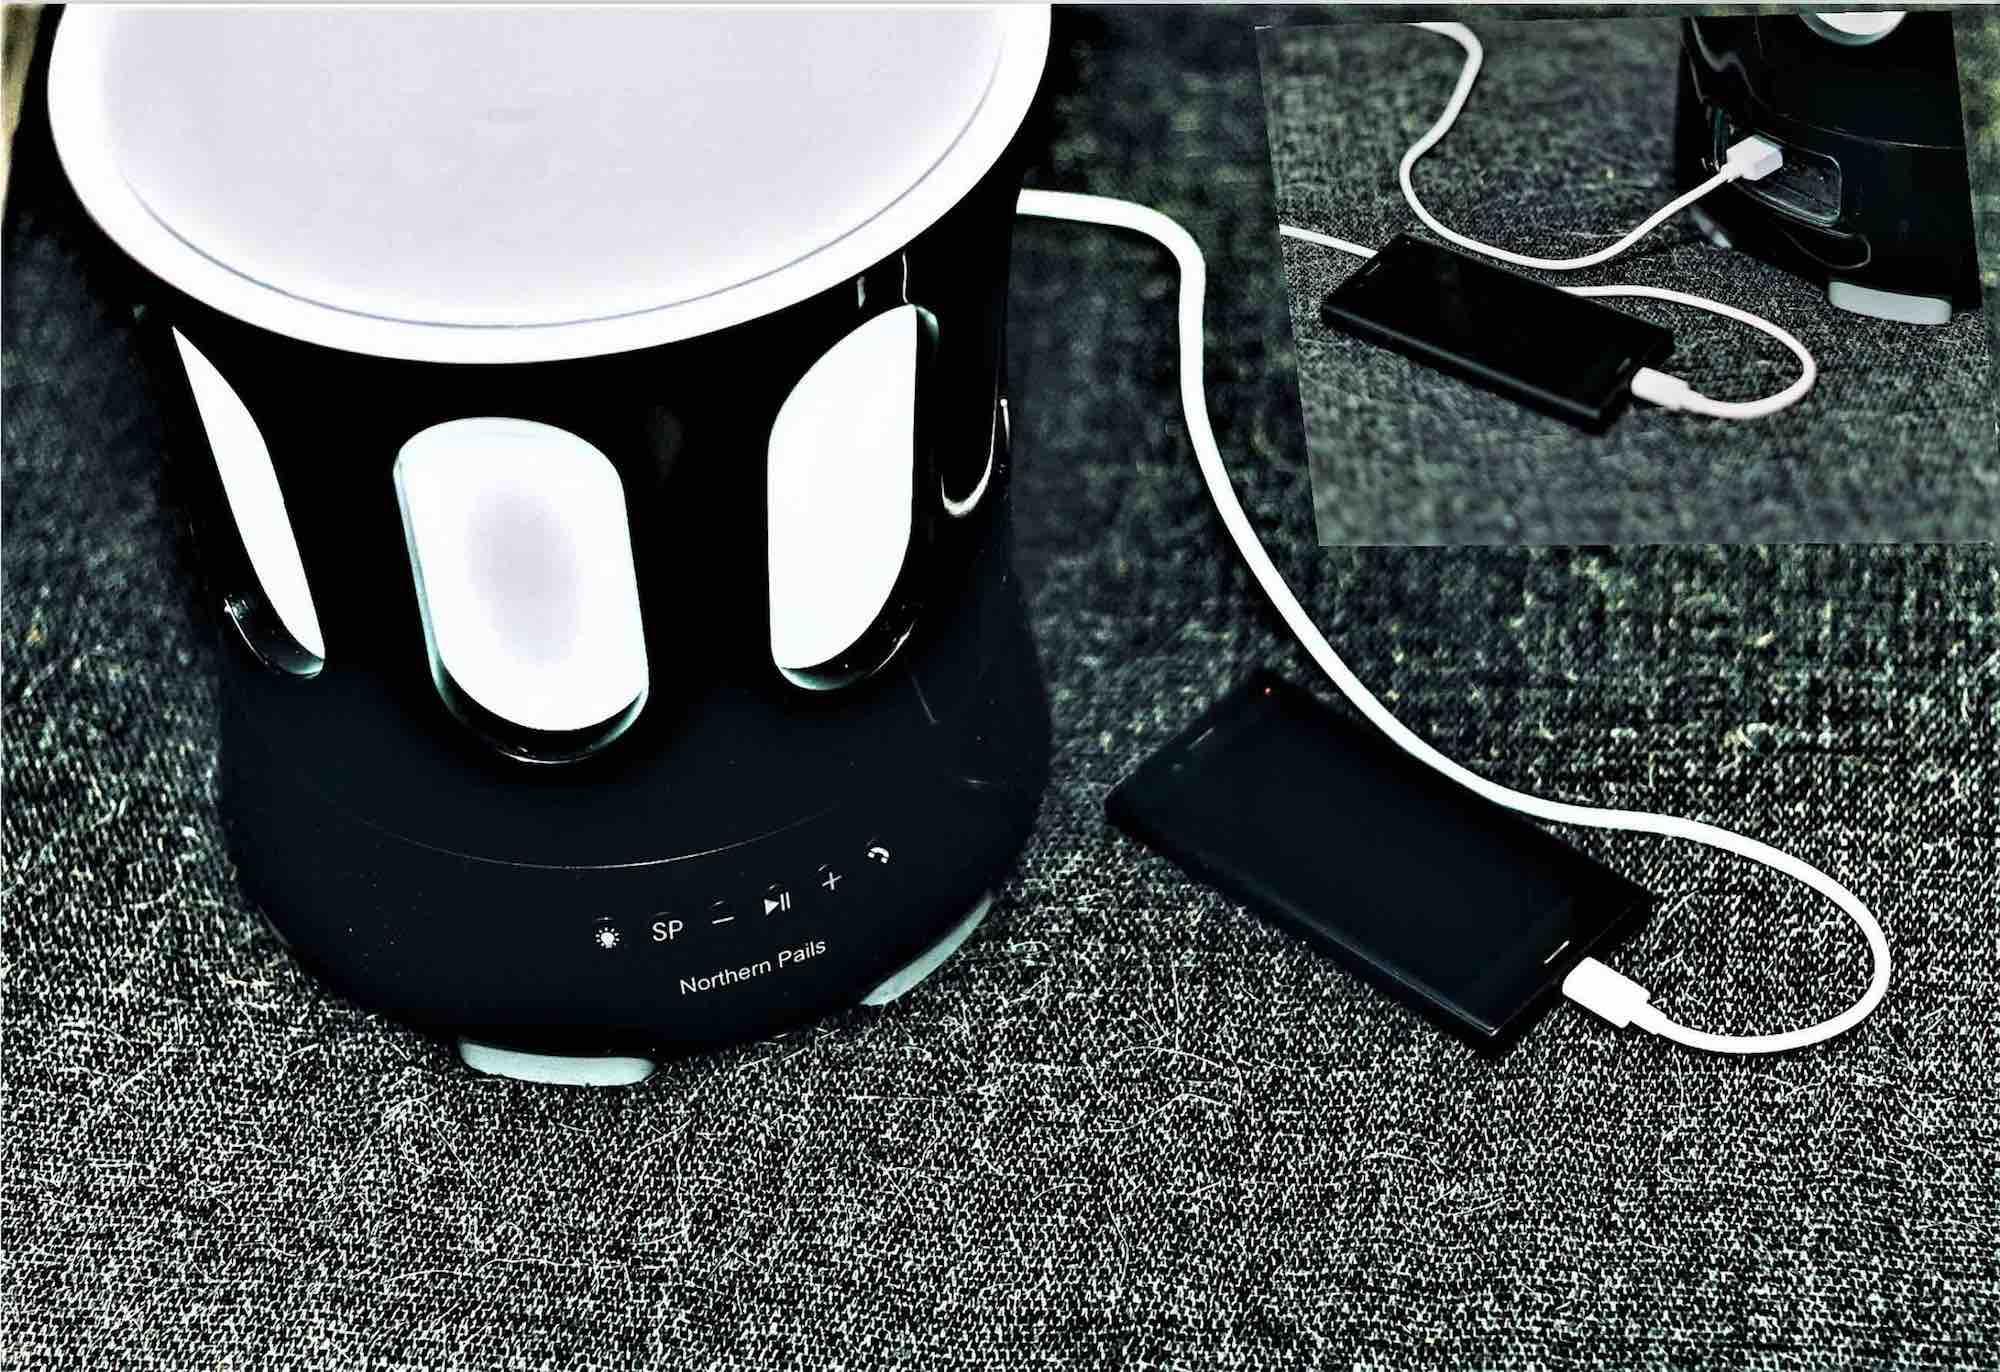 The Crown – Royal Bluetooth Speaker